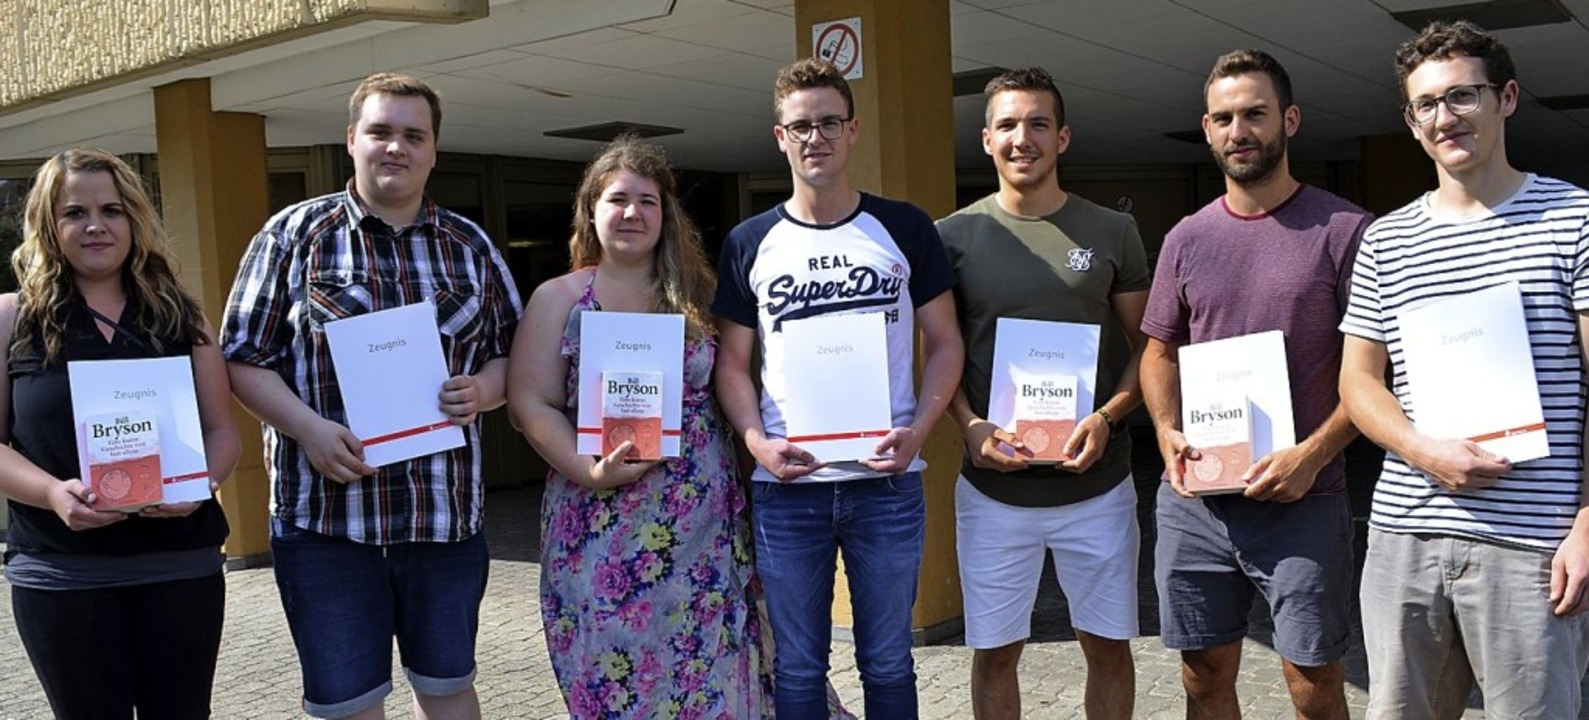 <BZ-FotoAnlauf>Gewerbeschule:  </BZ-Fo...Sozialpreis des Fördervereins erhielt.  | Foto: Schule